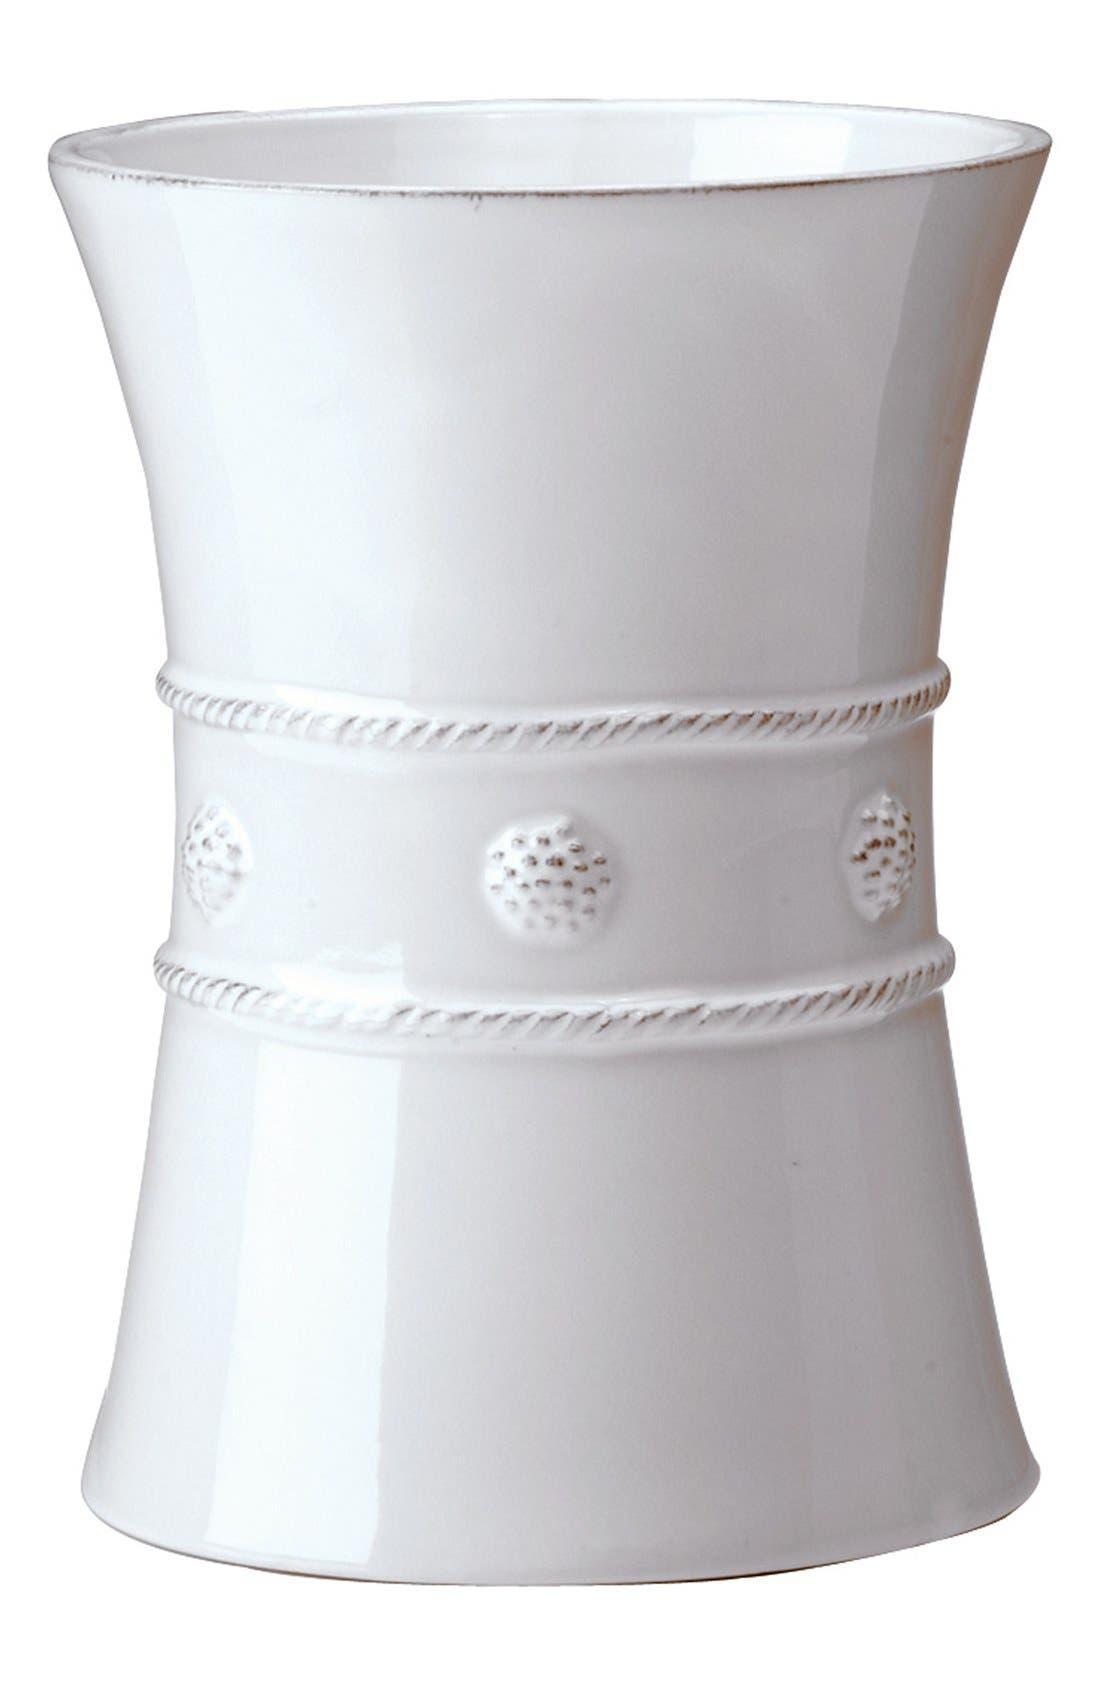 'Berry and Thread' Ceramic Utensil Crock,                         Main,                         color, Whitewash